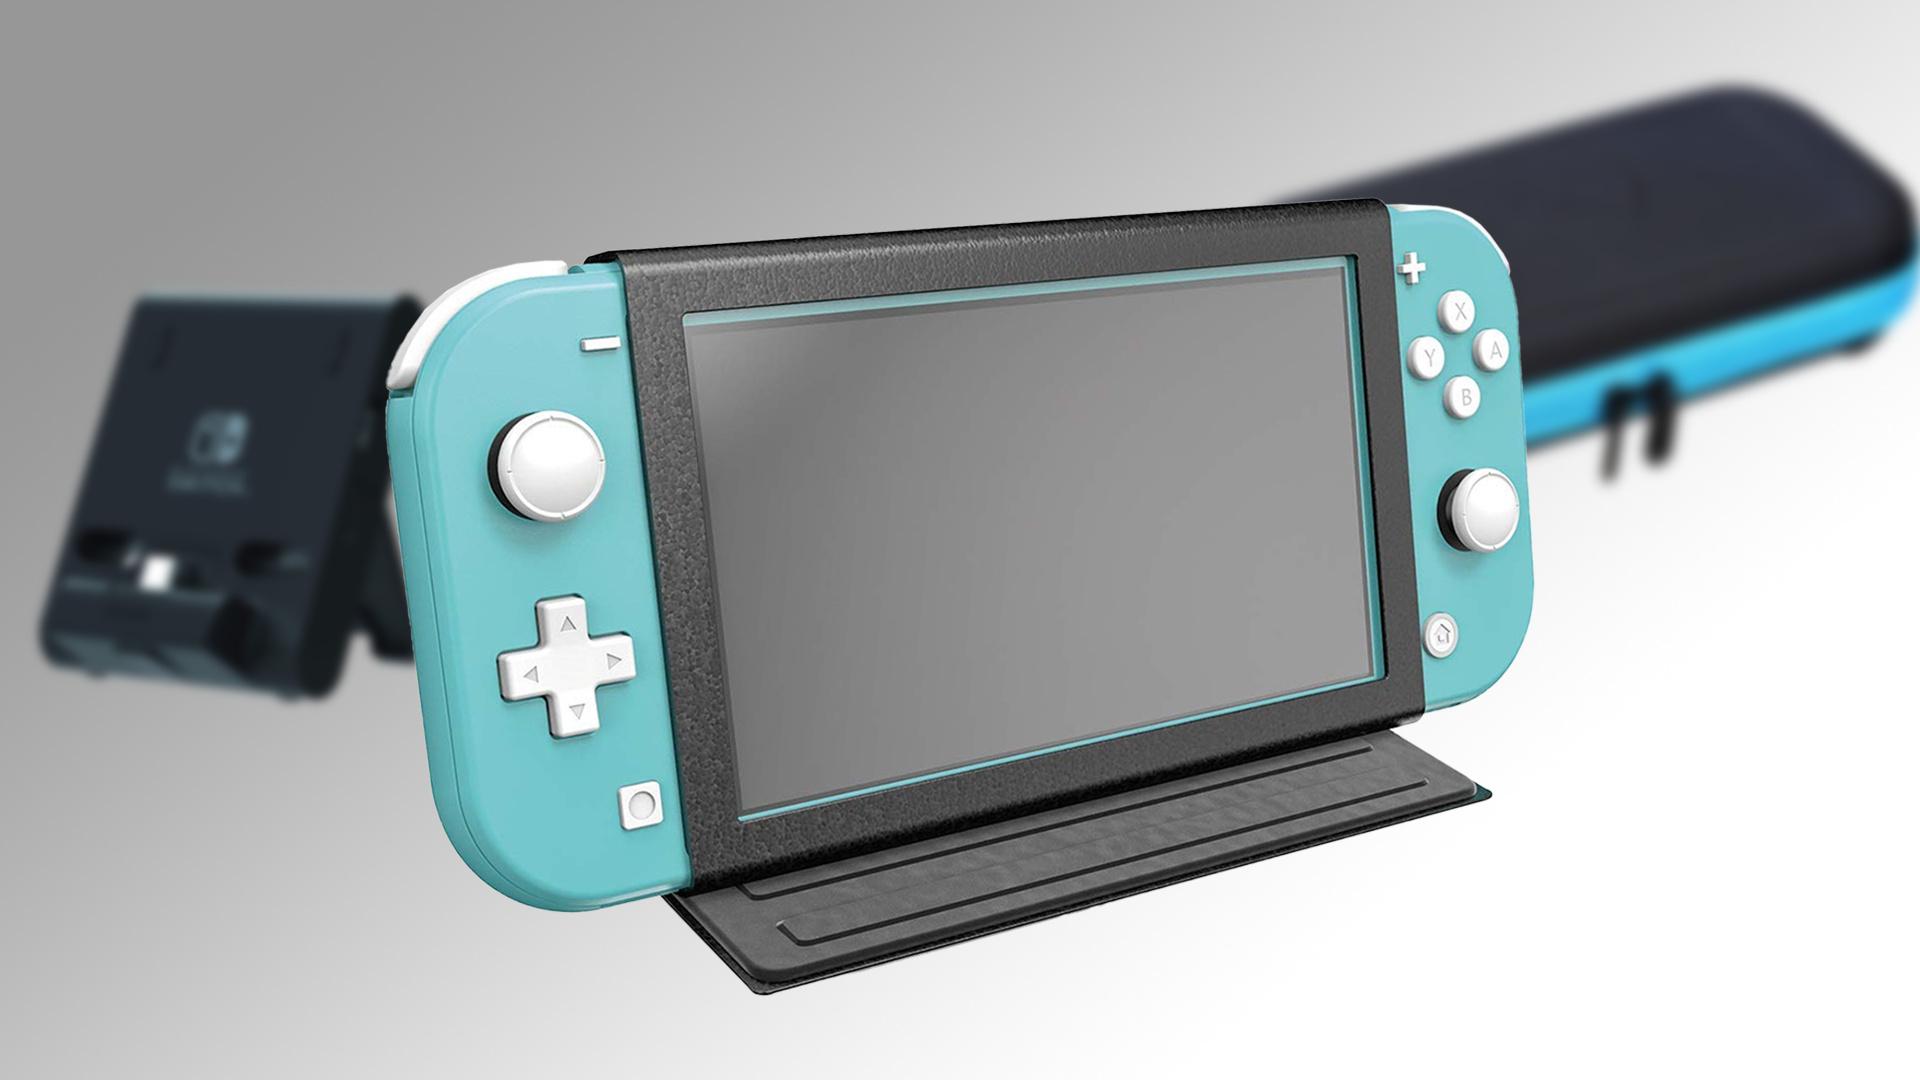 Nintendo Switch Leaker Pleads Guilty For Hacking Nintendo